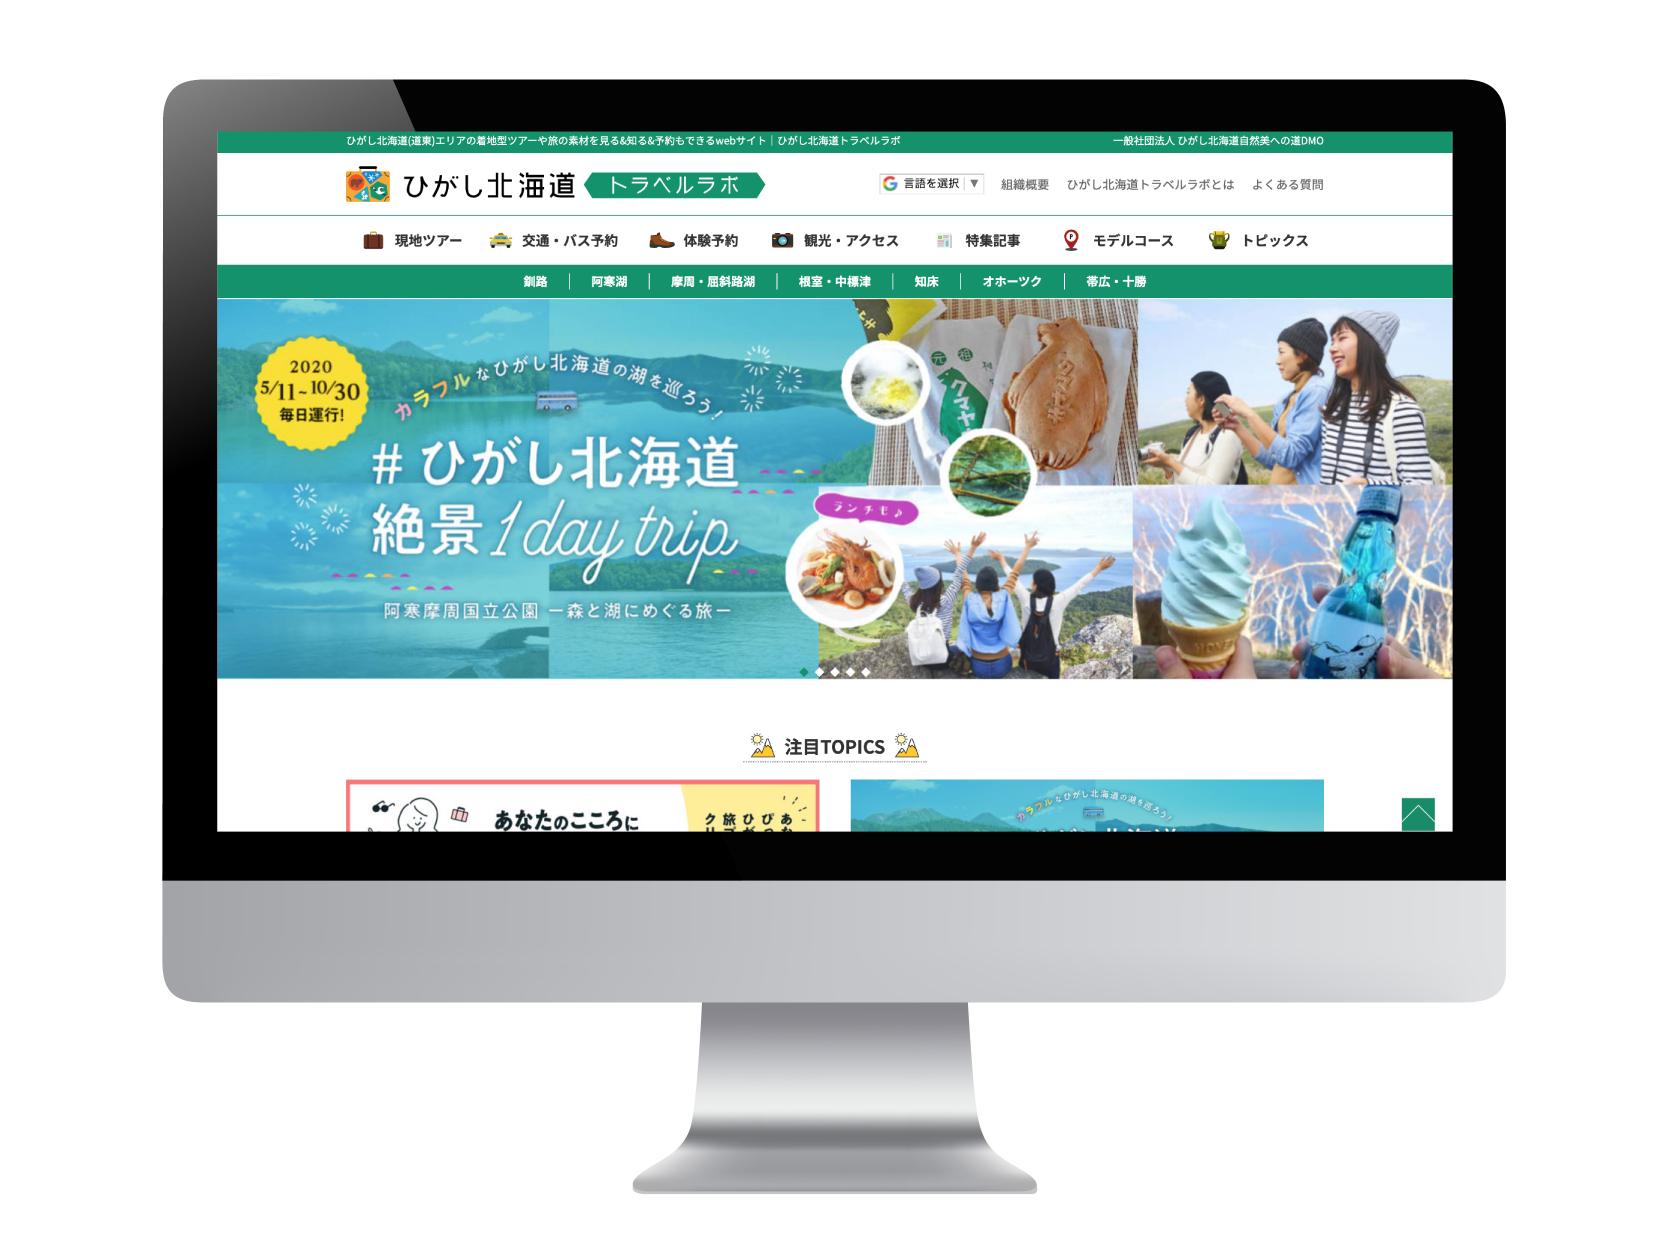 <span>Official web site</span><br>ひがし北海道自然美への道DMO<br>ひがし北海道トラベルラボ